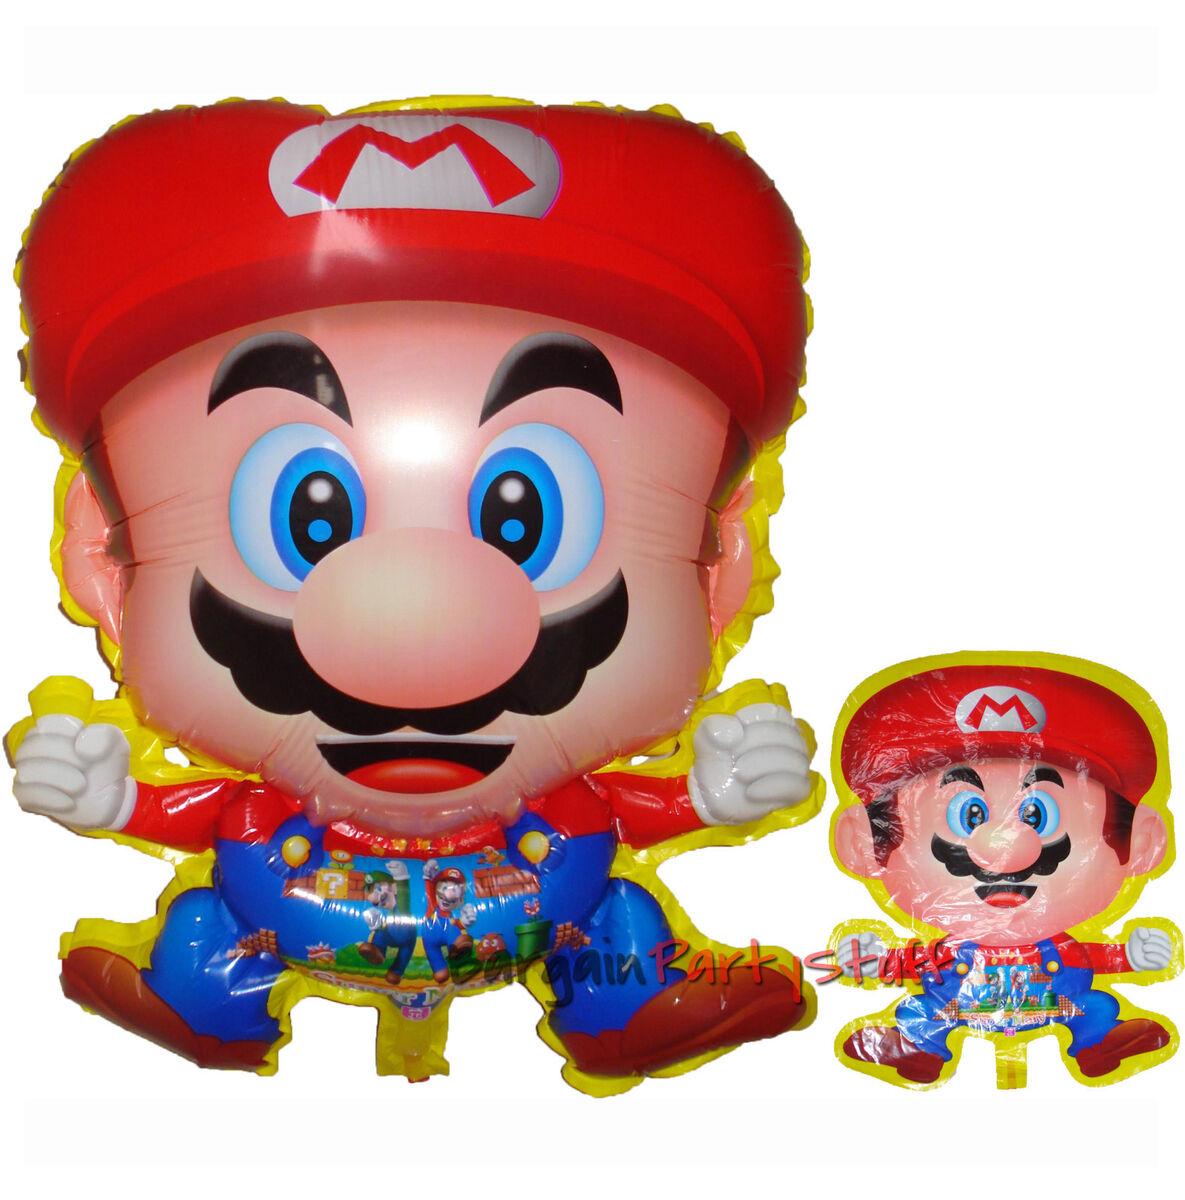 3X Jumbo Super Mario Bros Birthday Mylar Balloon Party Supplies